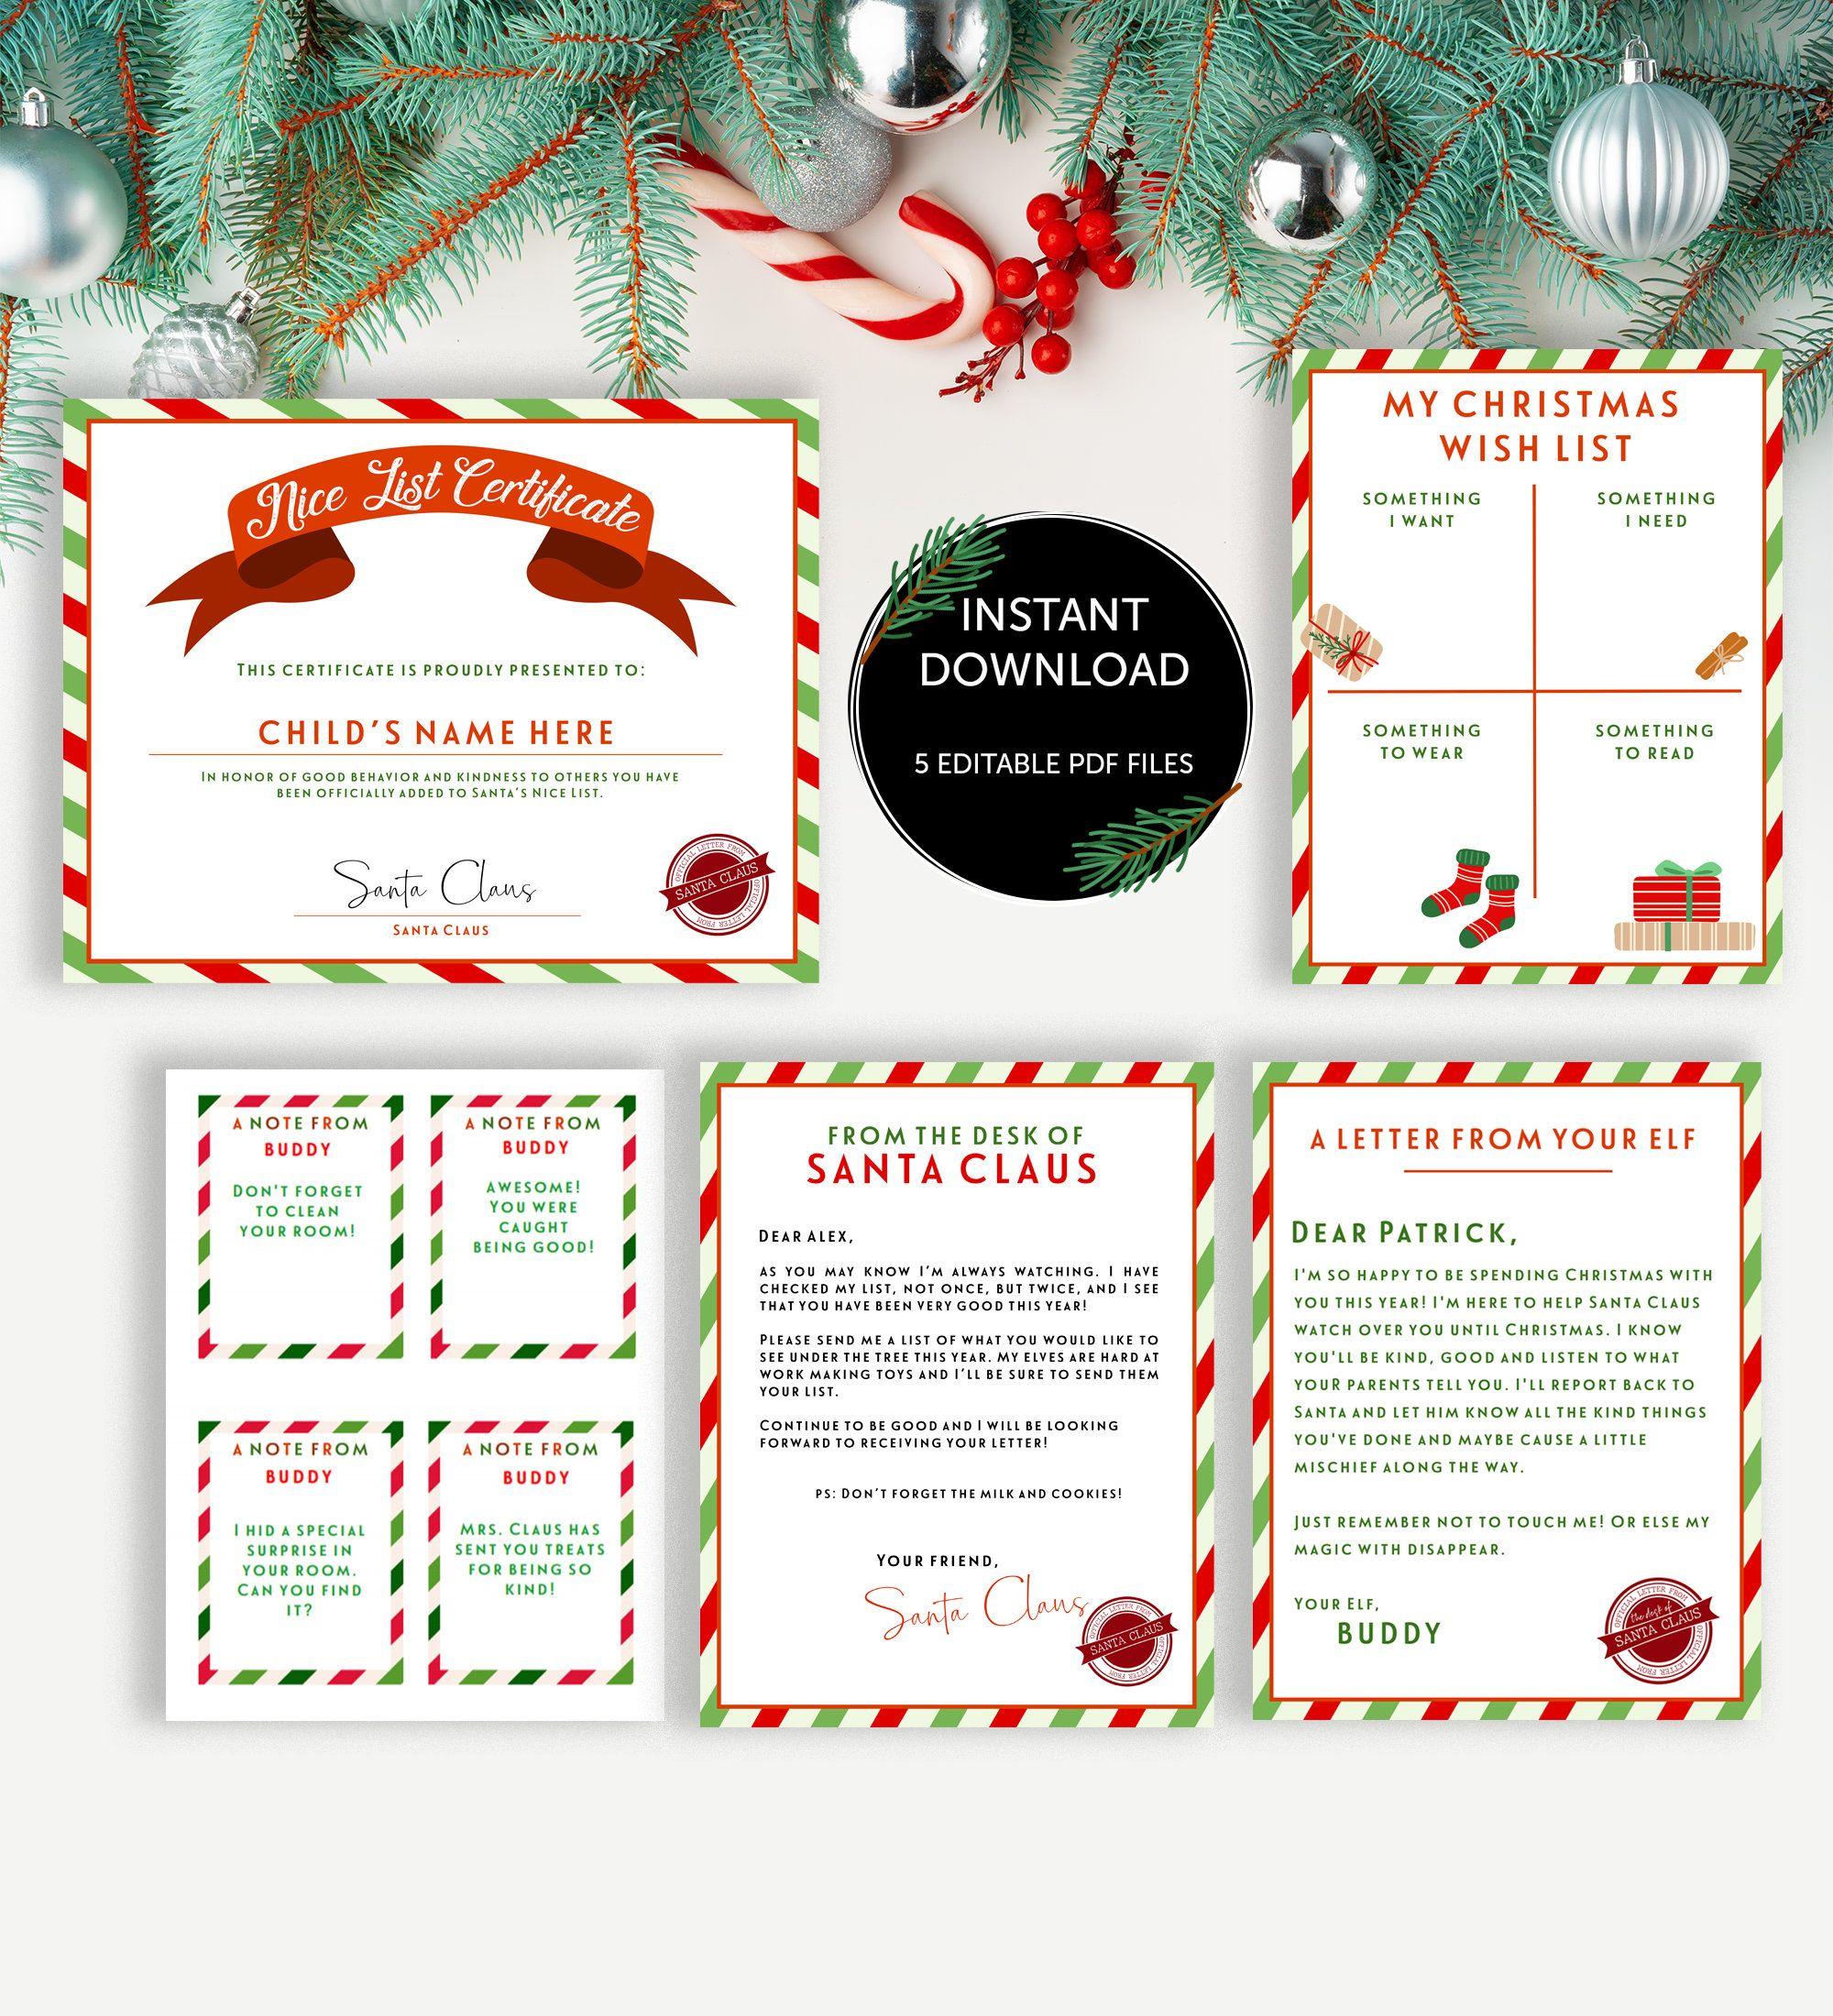 Christmas Letter Bundle, Letter From Santa, Nice List